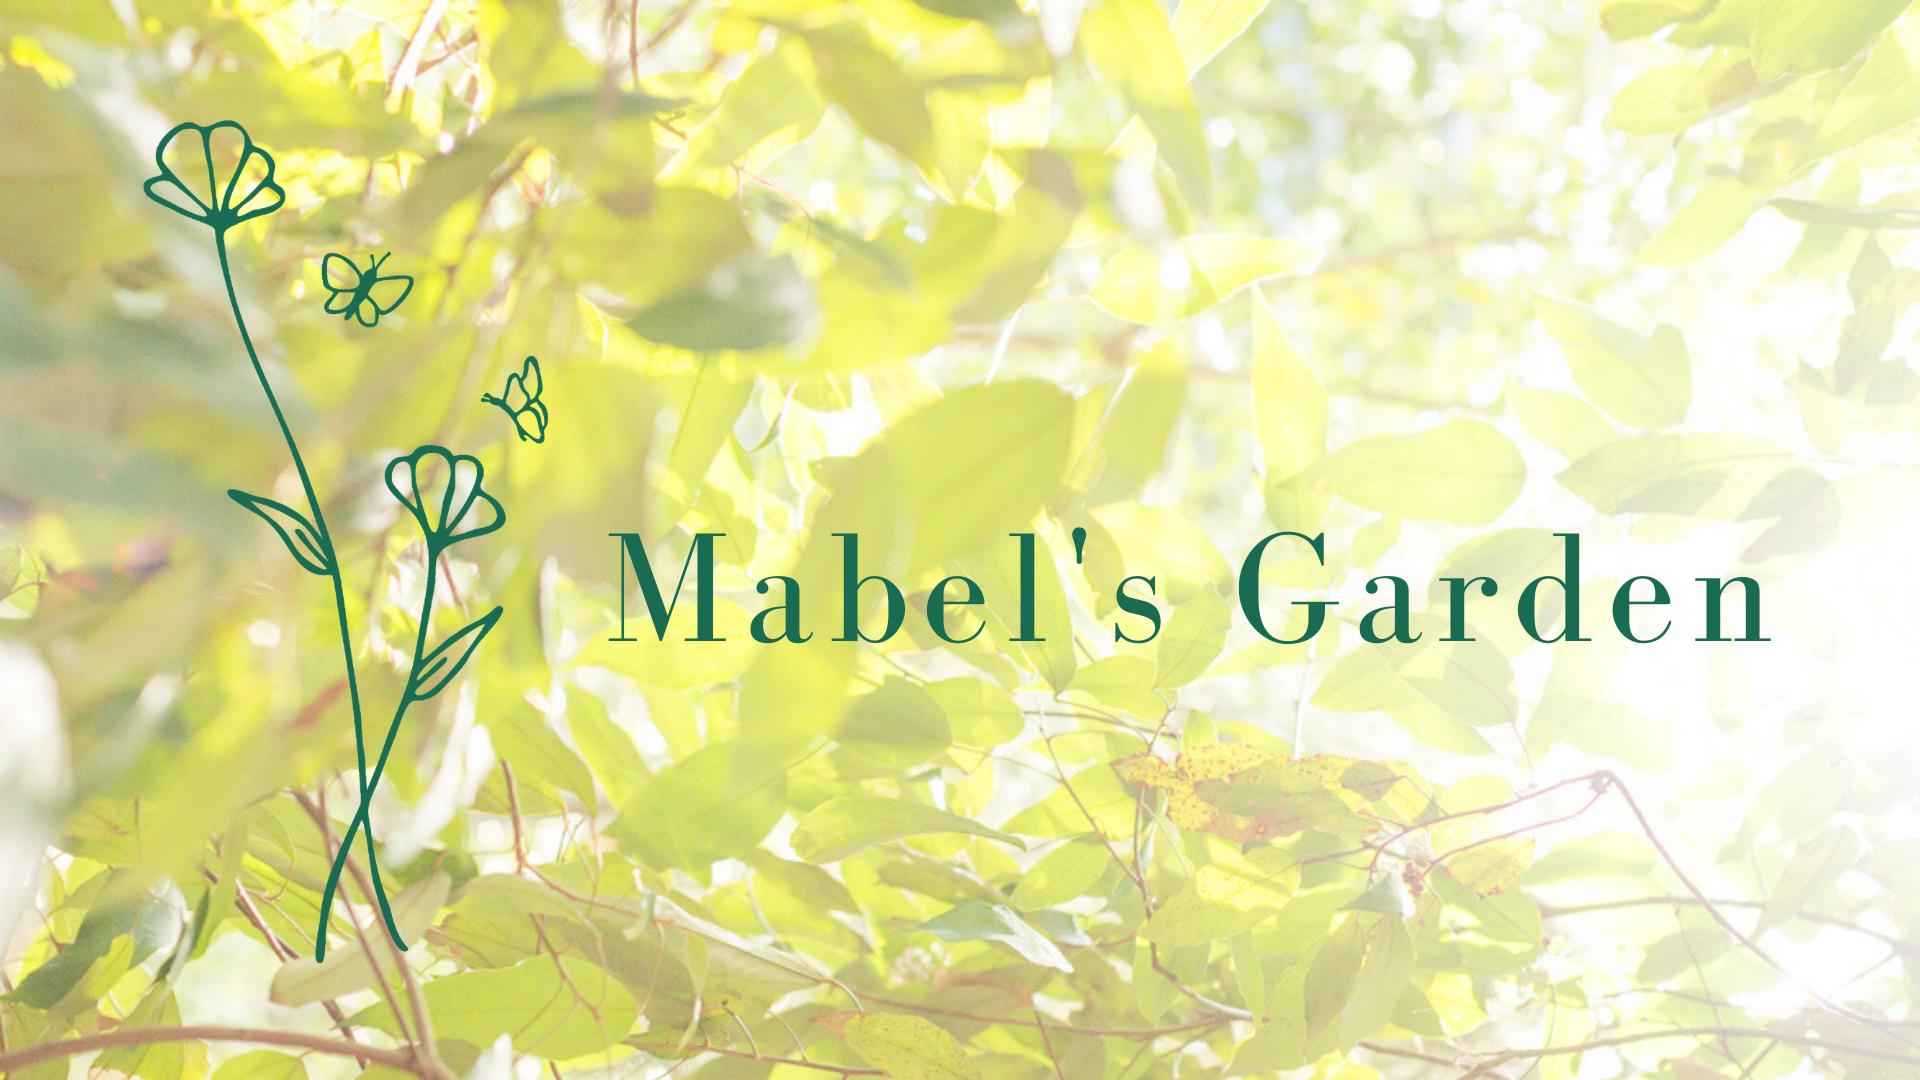 Mabel's Garden